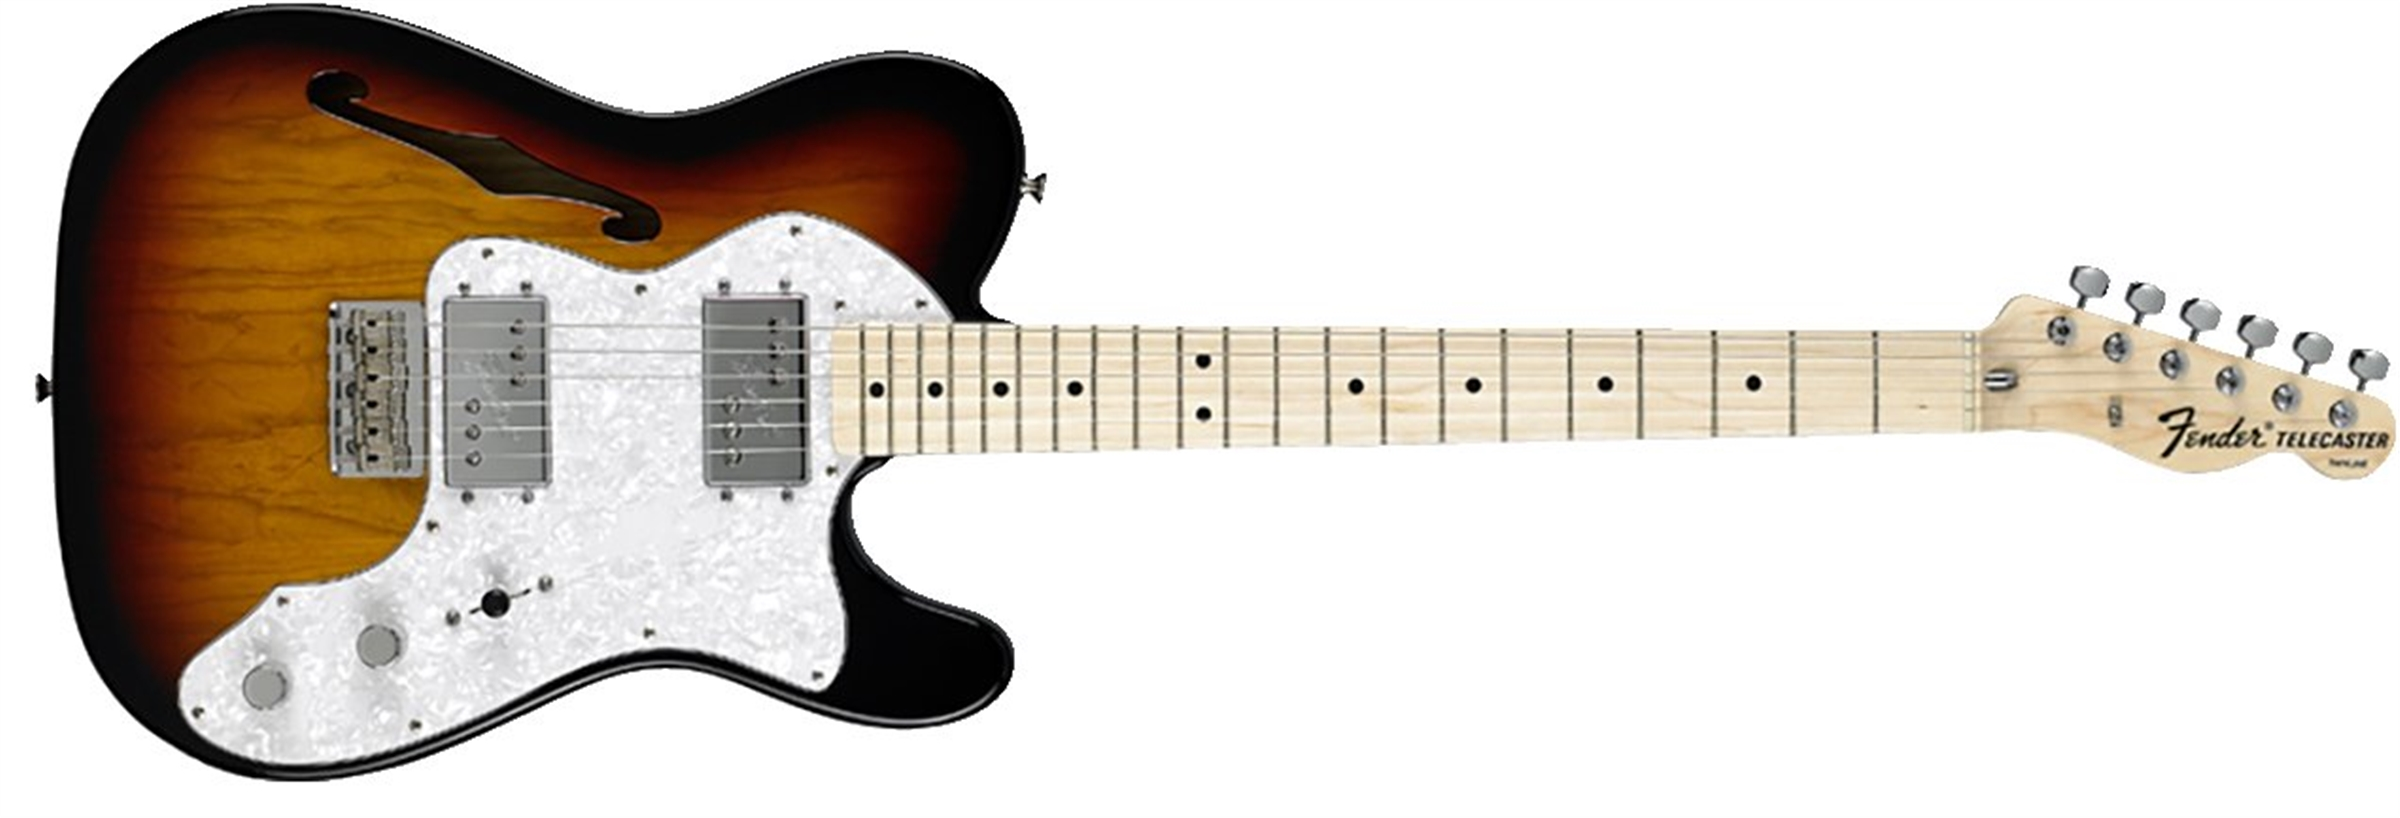 Fender Classic Series 72 Telecaster 174 Thinline Maple